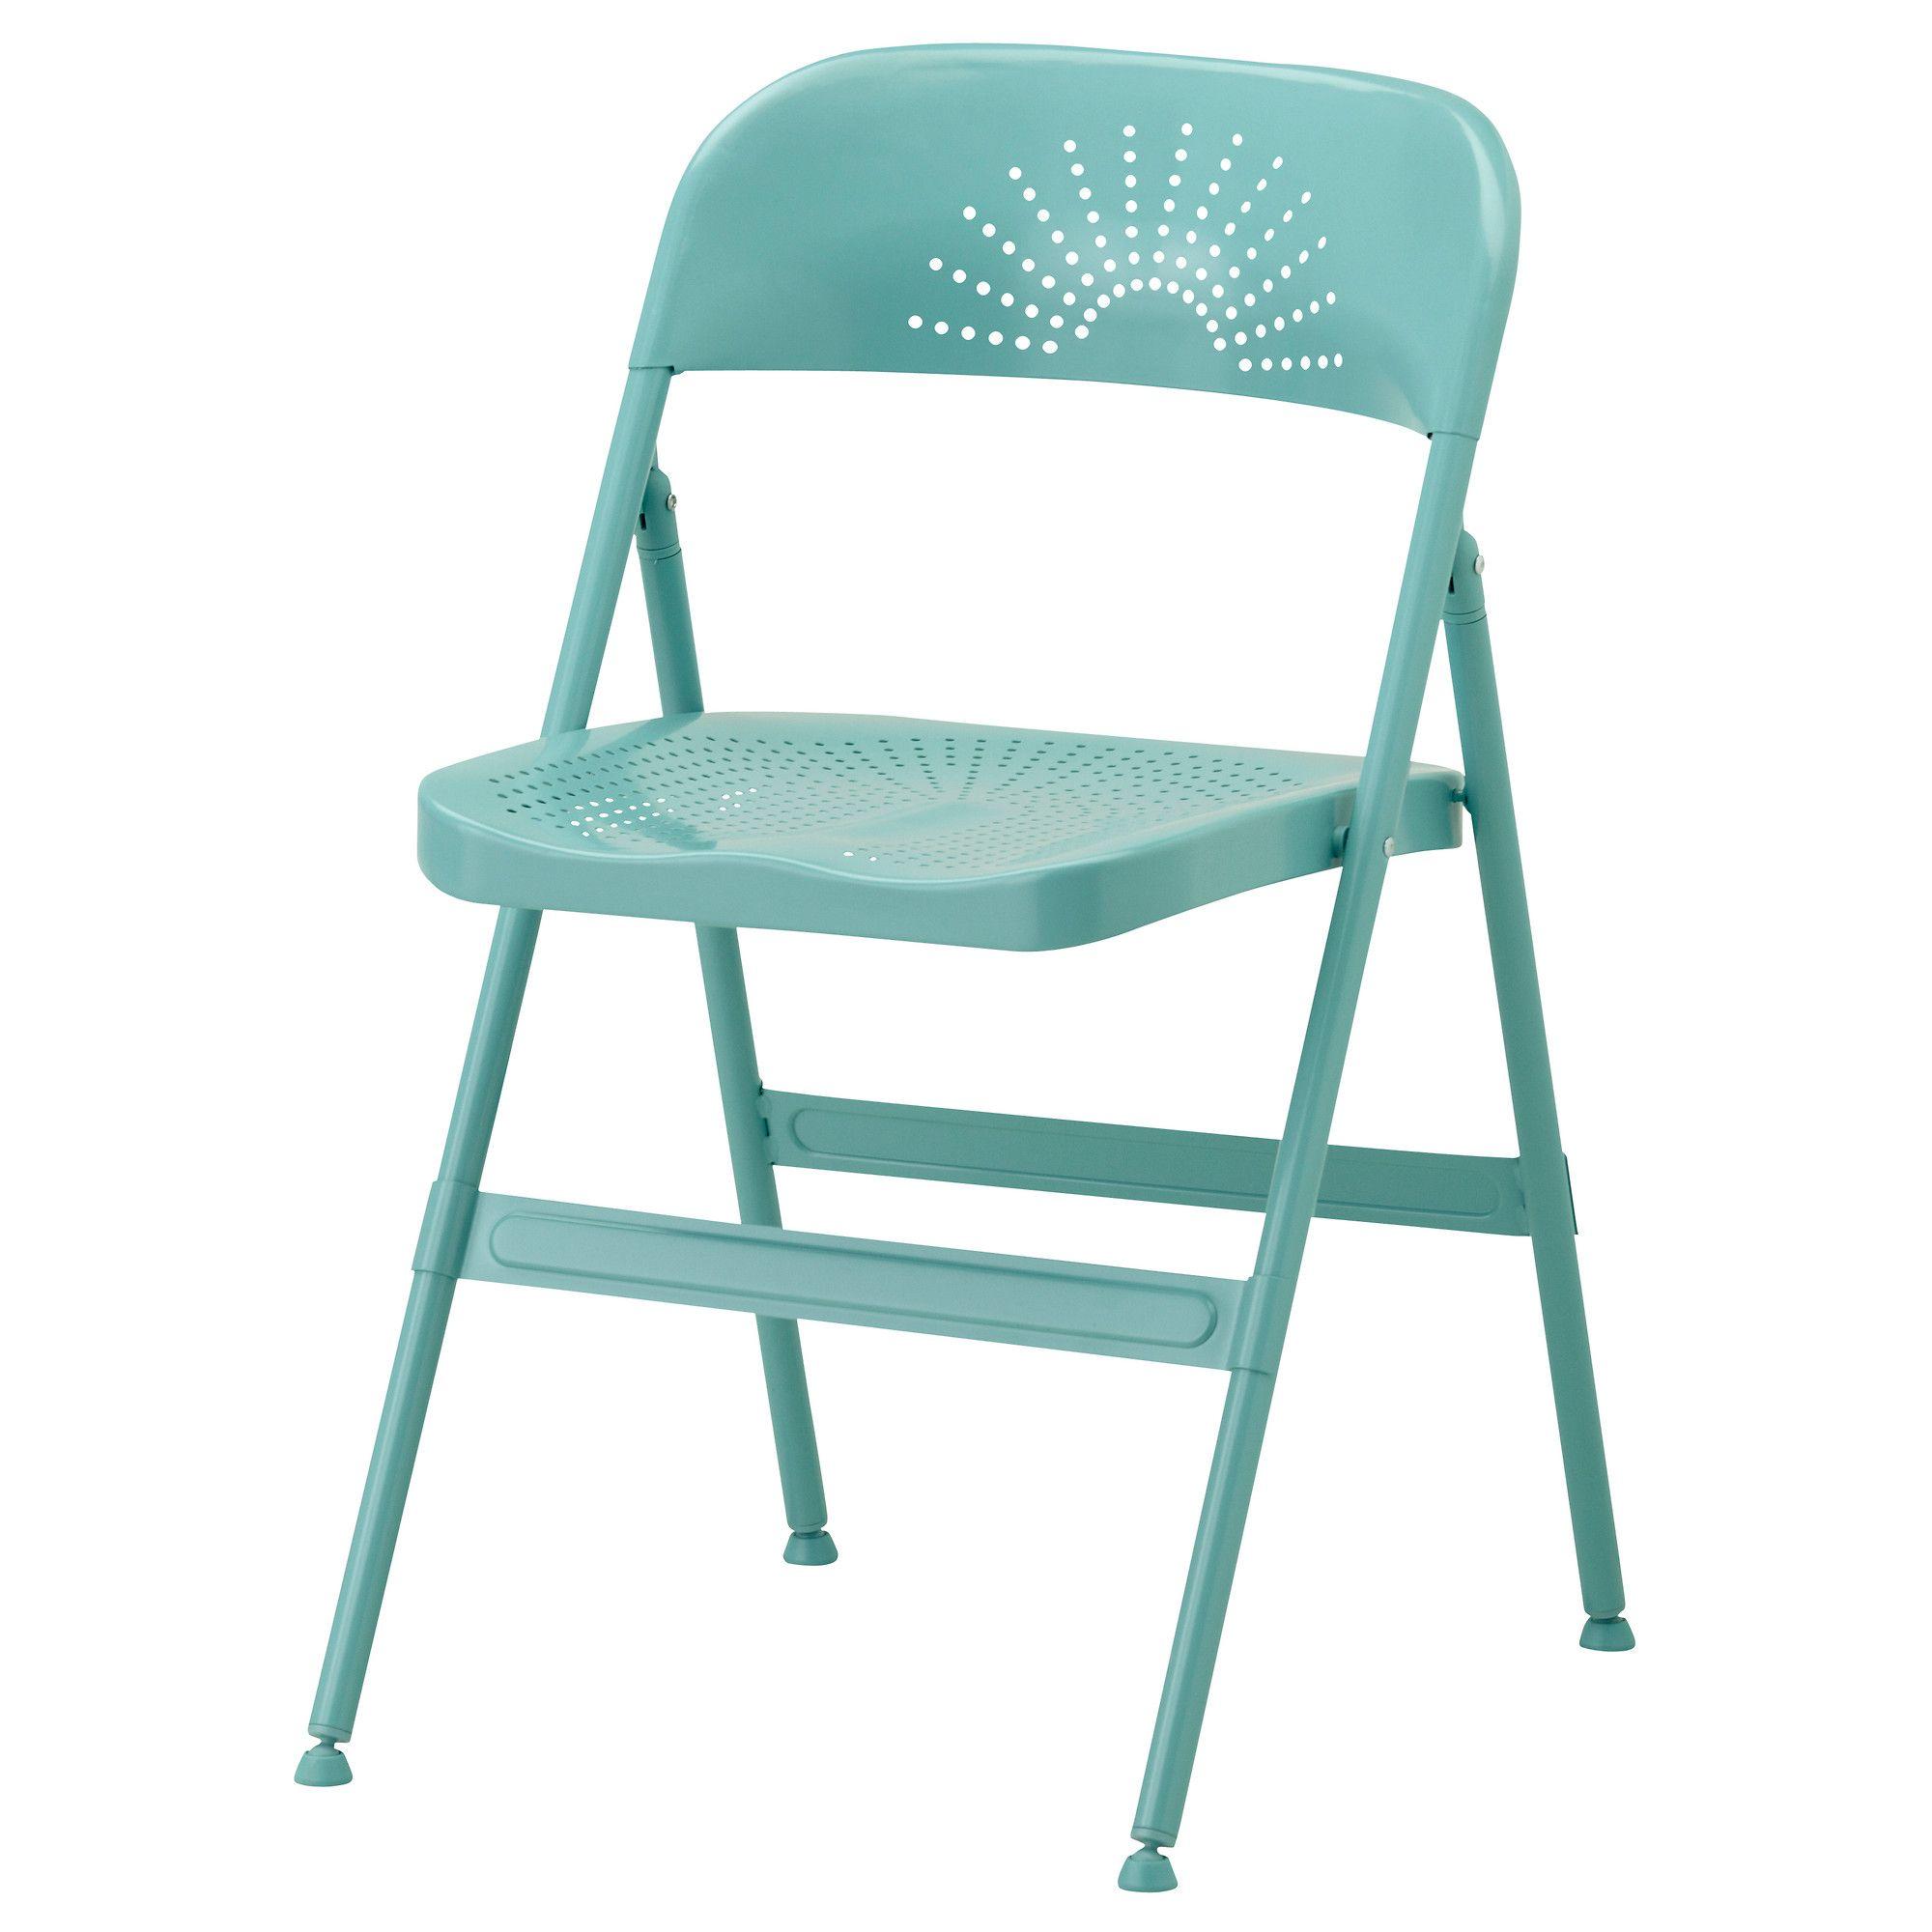 frode cadeira dobrvel turquesa metal folding chairsmetal